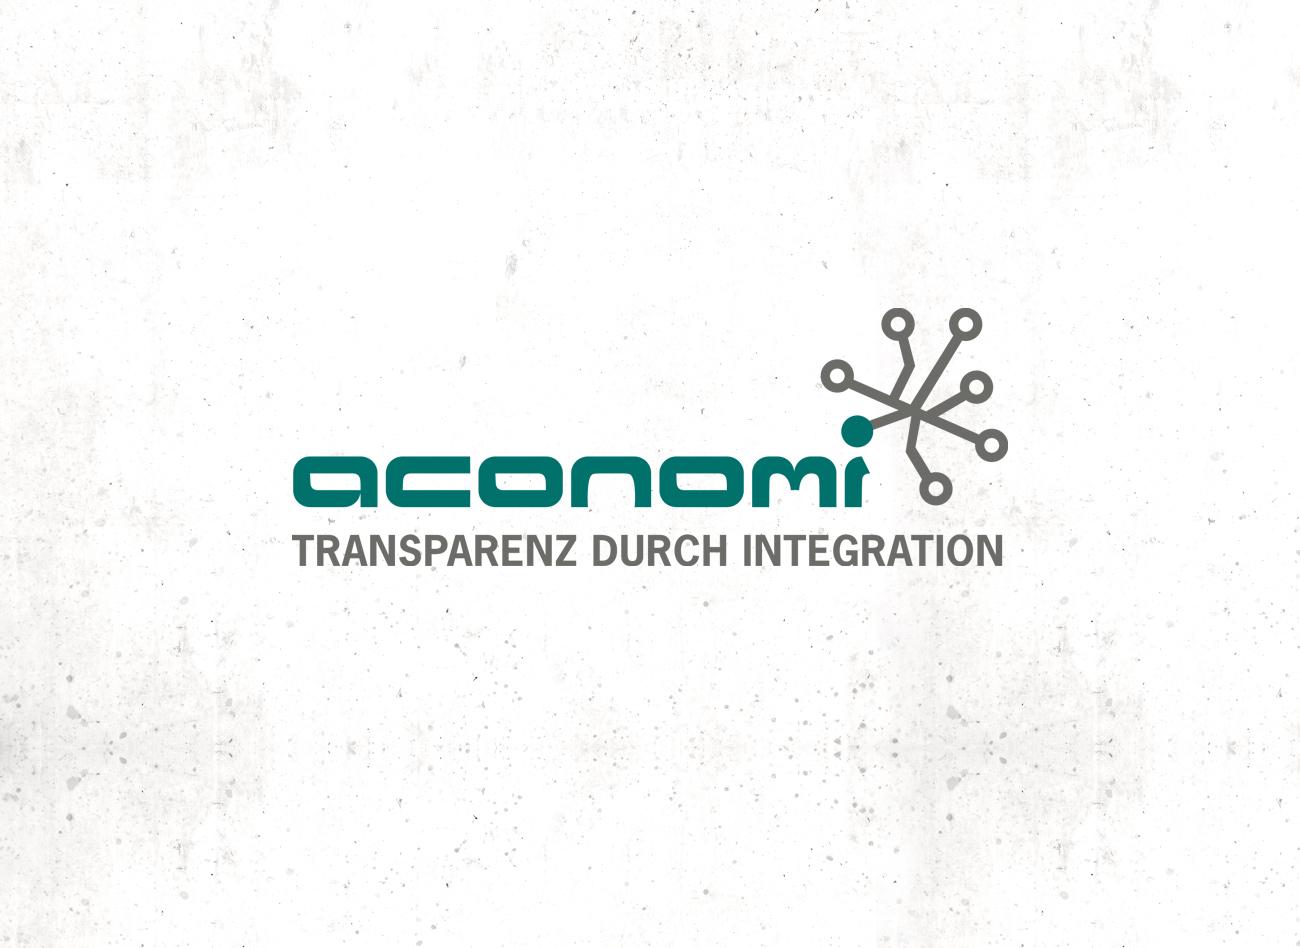 Logogestaltung / aconomie